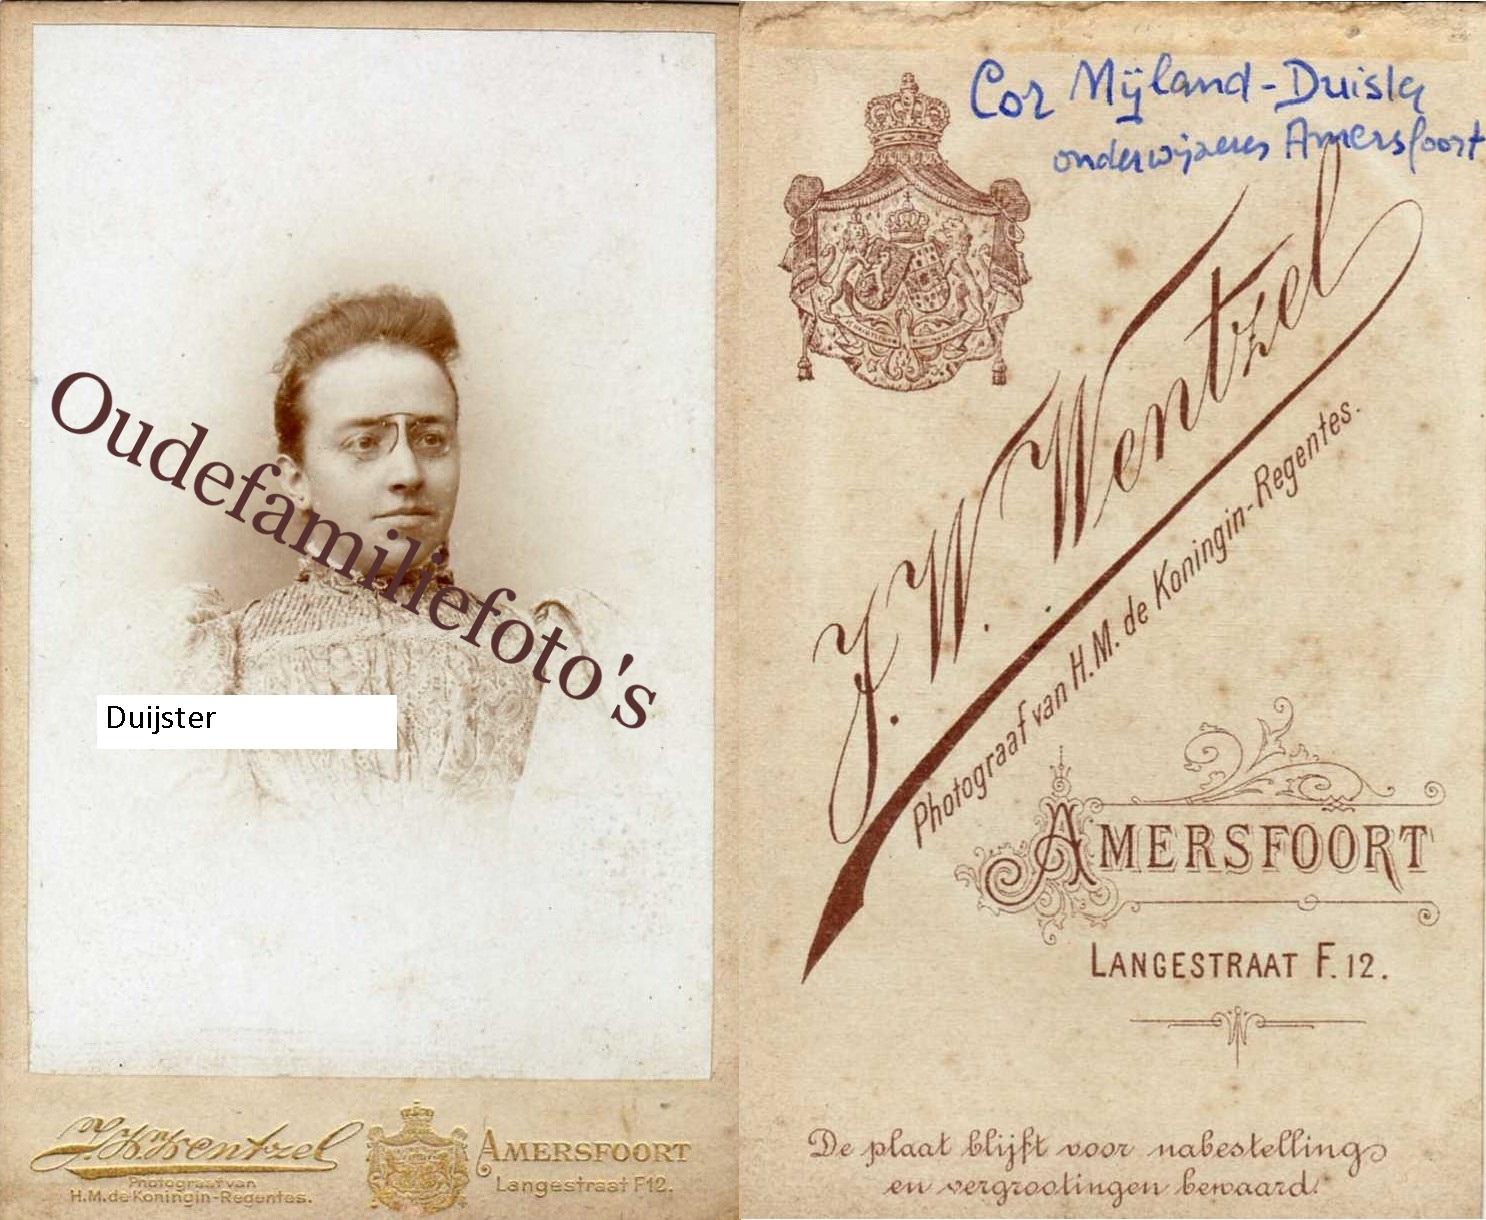 Duijster, Anna Cornelia Maria Jacoba. Geb. 13-12-1865 Leiden Ovl. 31-12-1947 Delden. Getrouwd met G.F. Nijland € 3,00